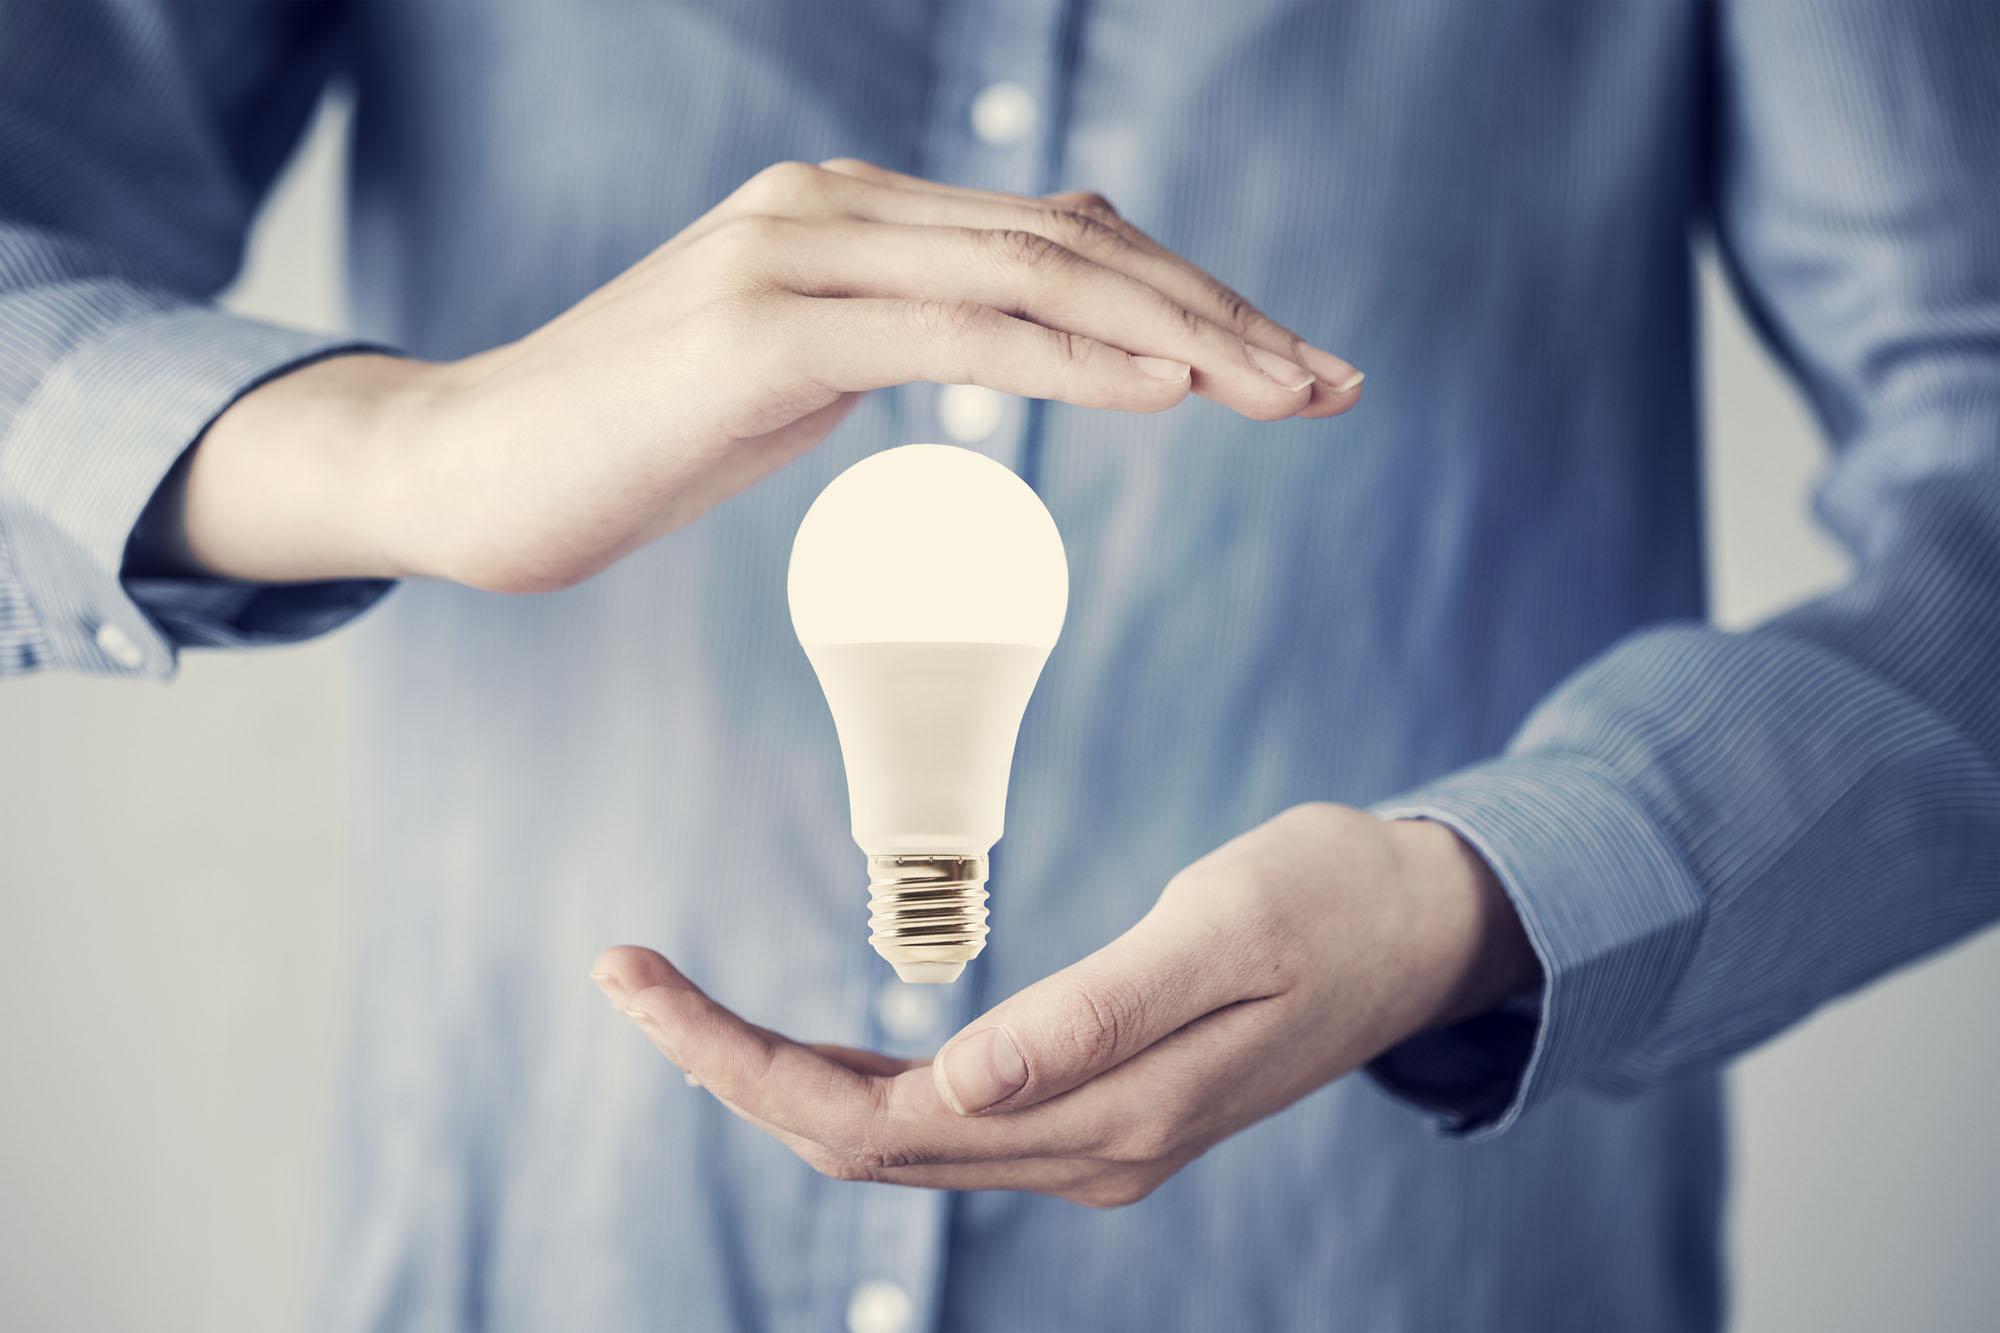 LED bulbs shine brighter